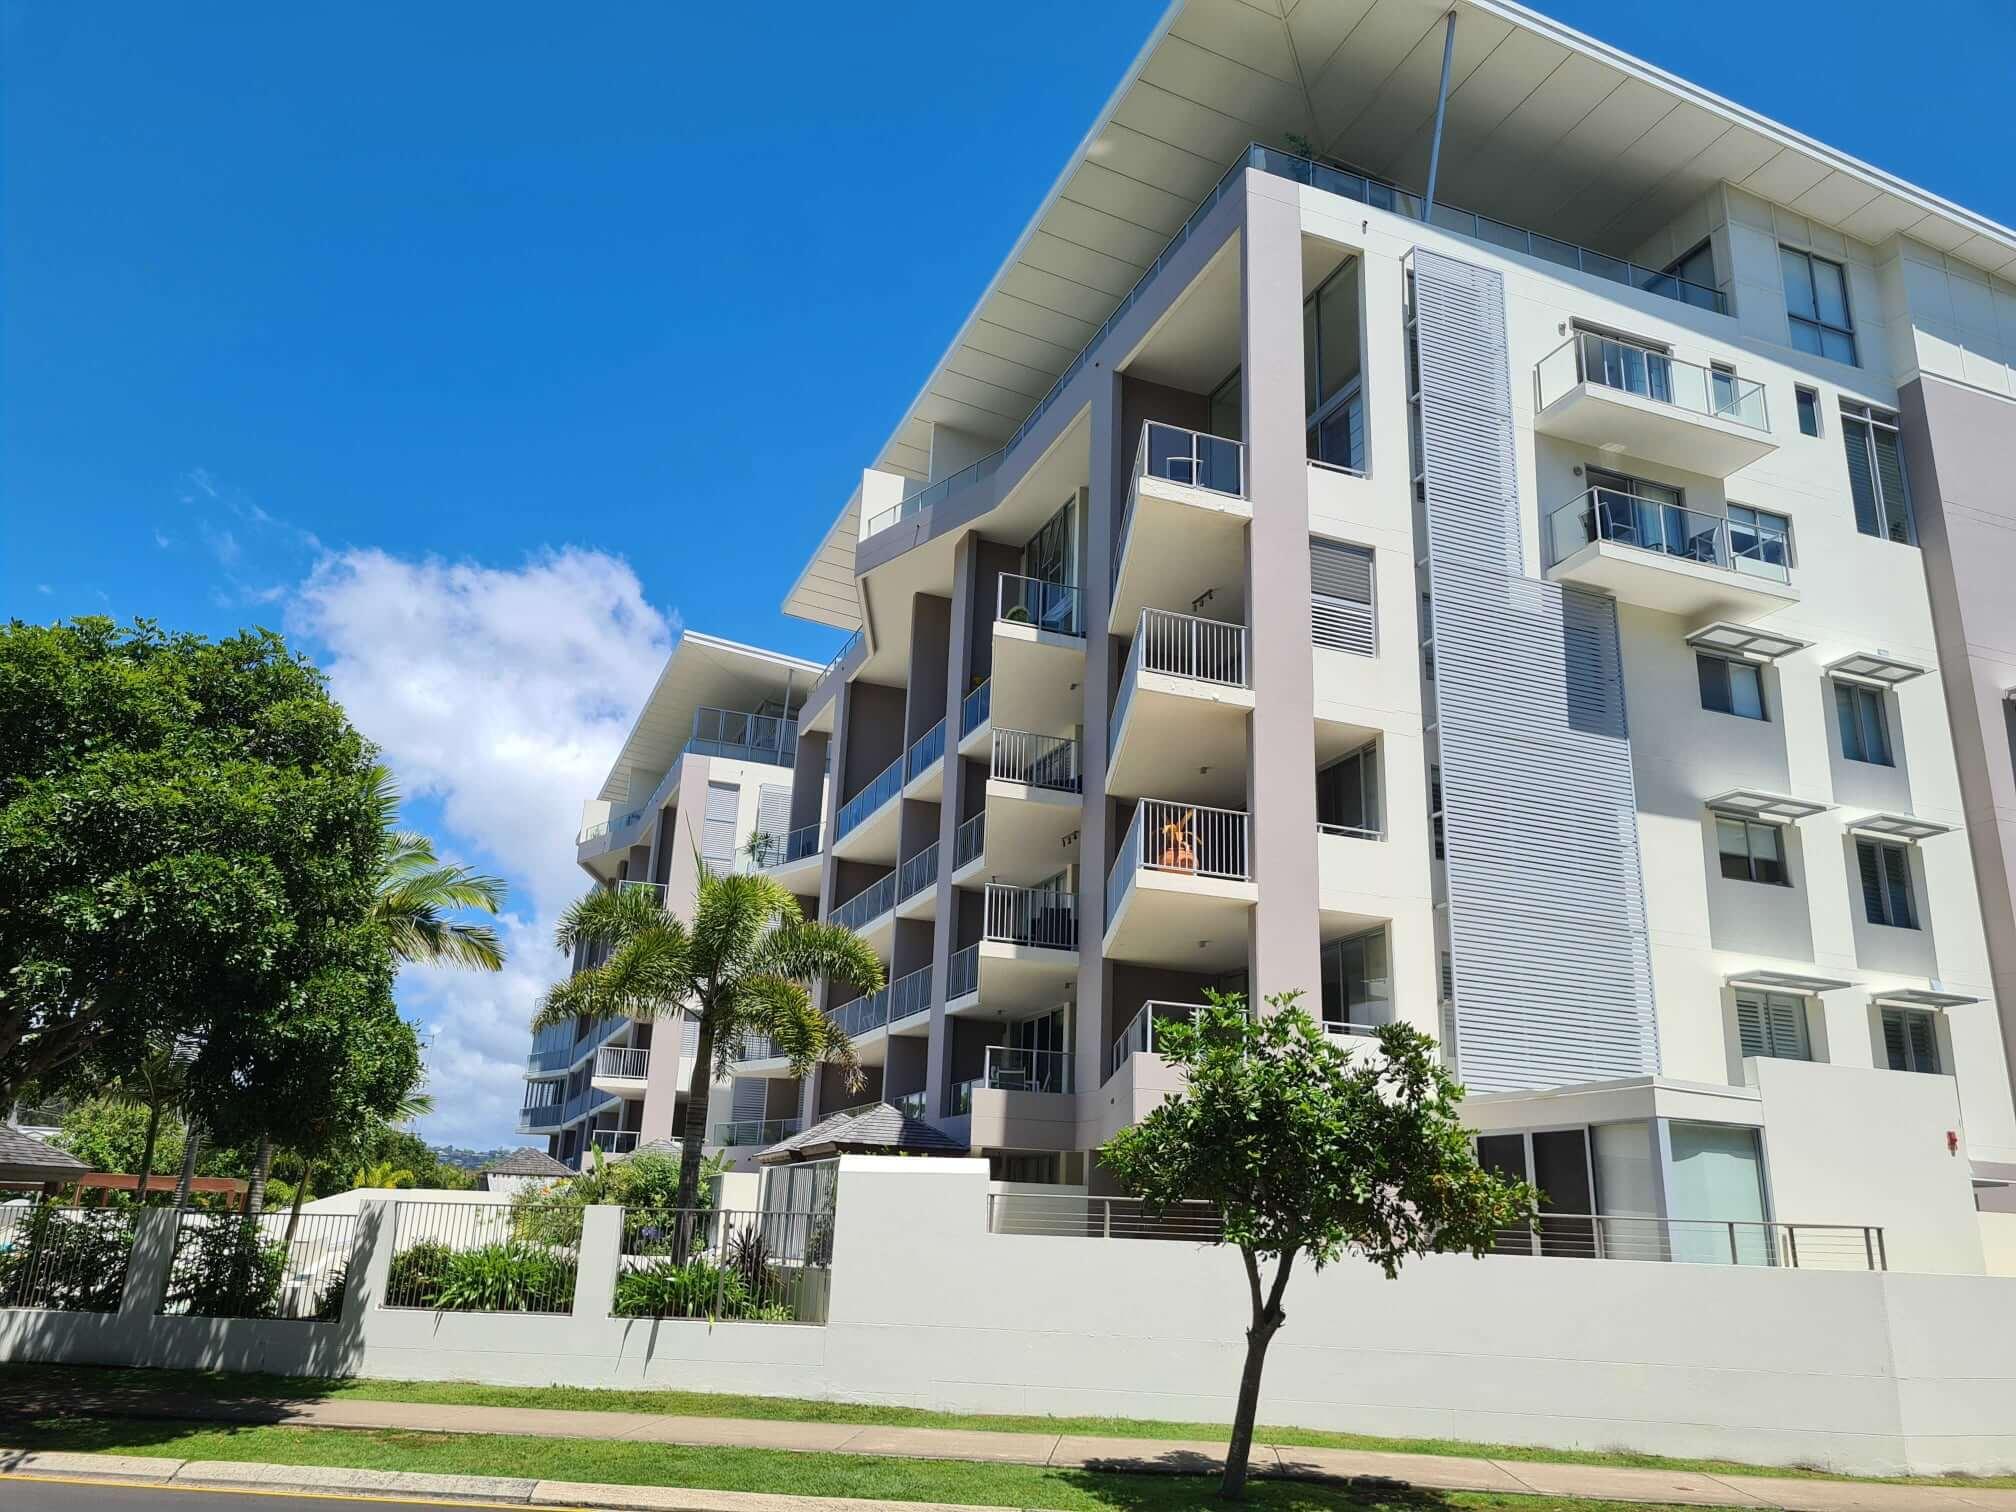 thermann - Karmasea Apartments - Sunpak Hot Water Sunshine Coast - Hot Water Installation & Service